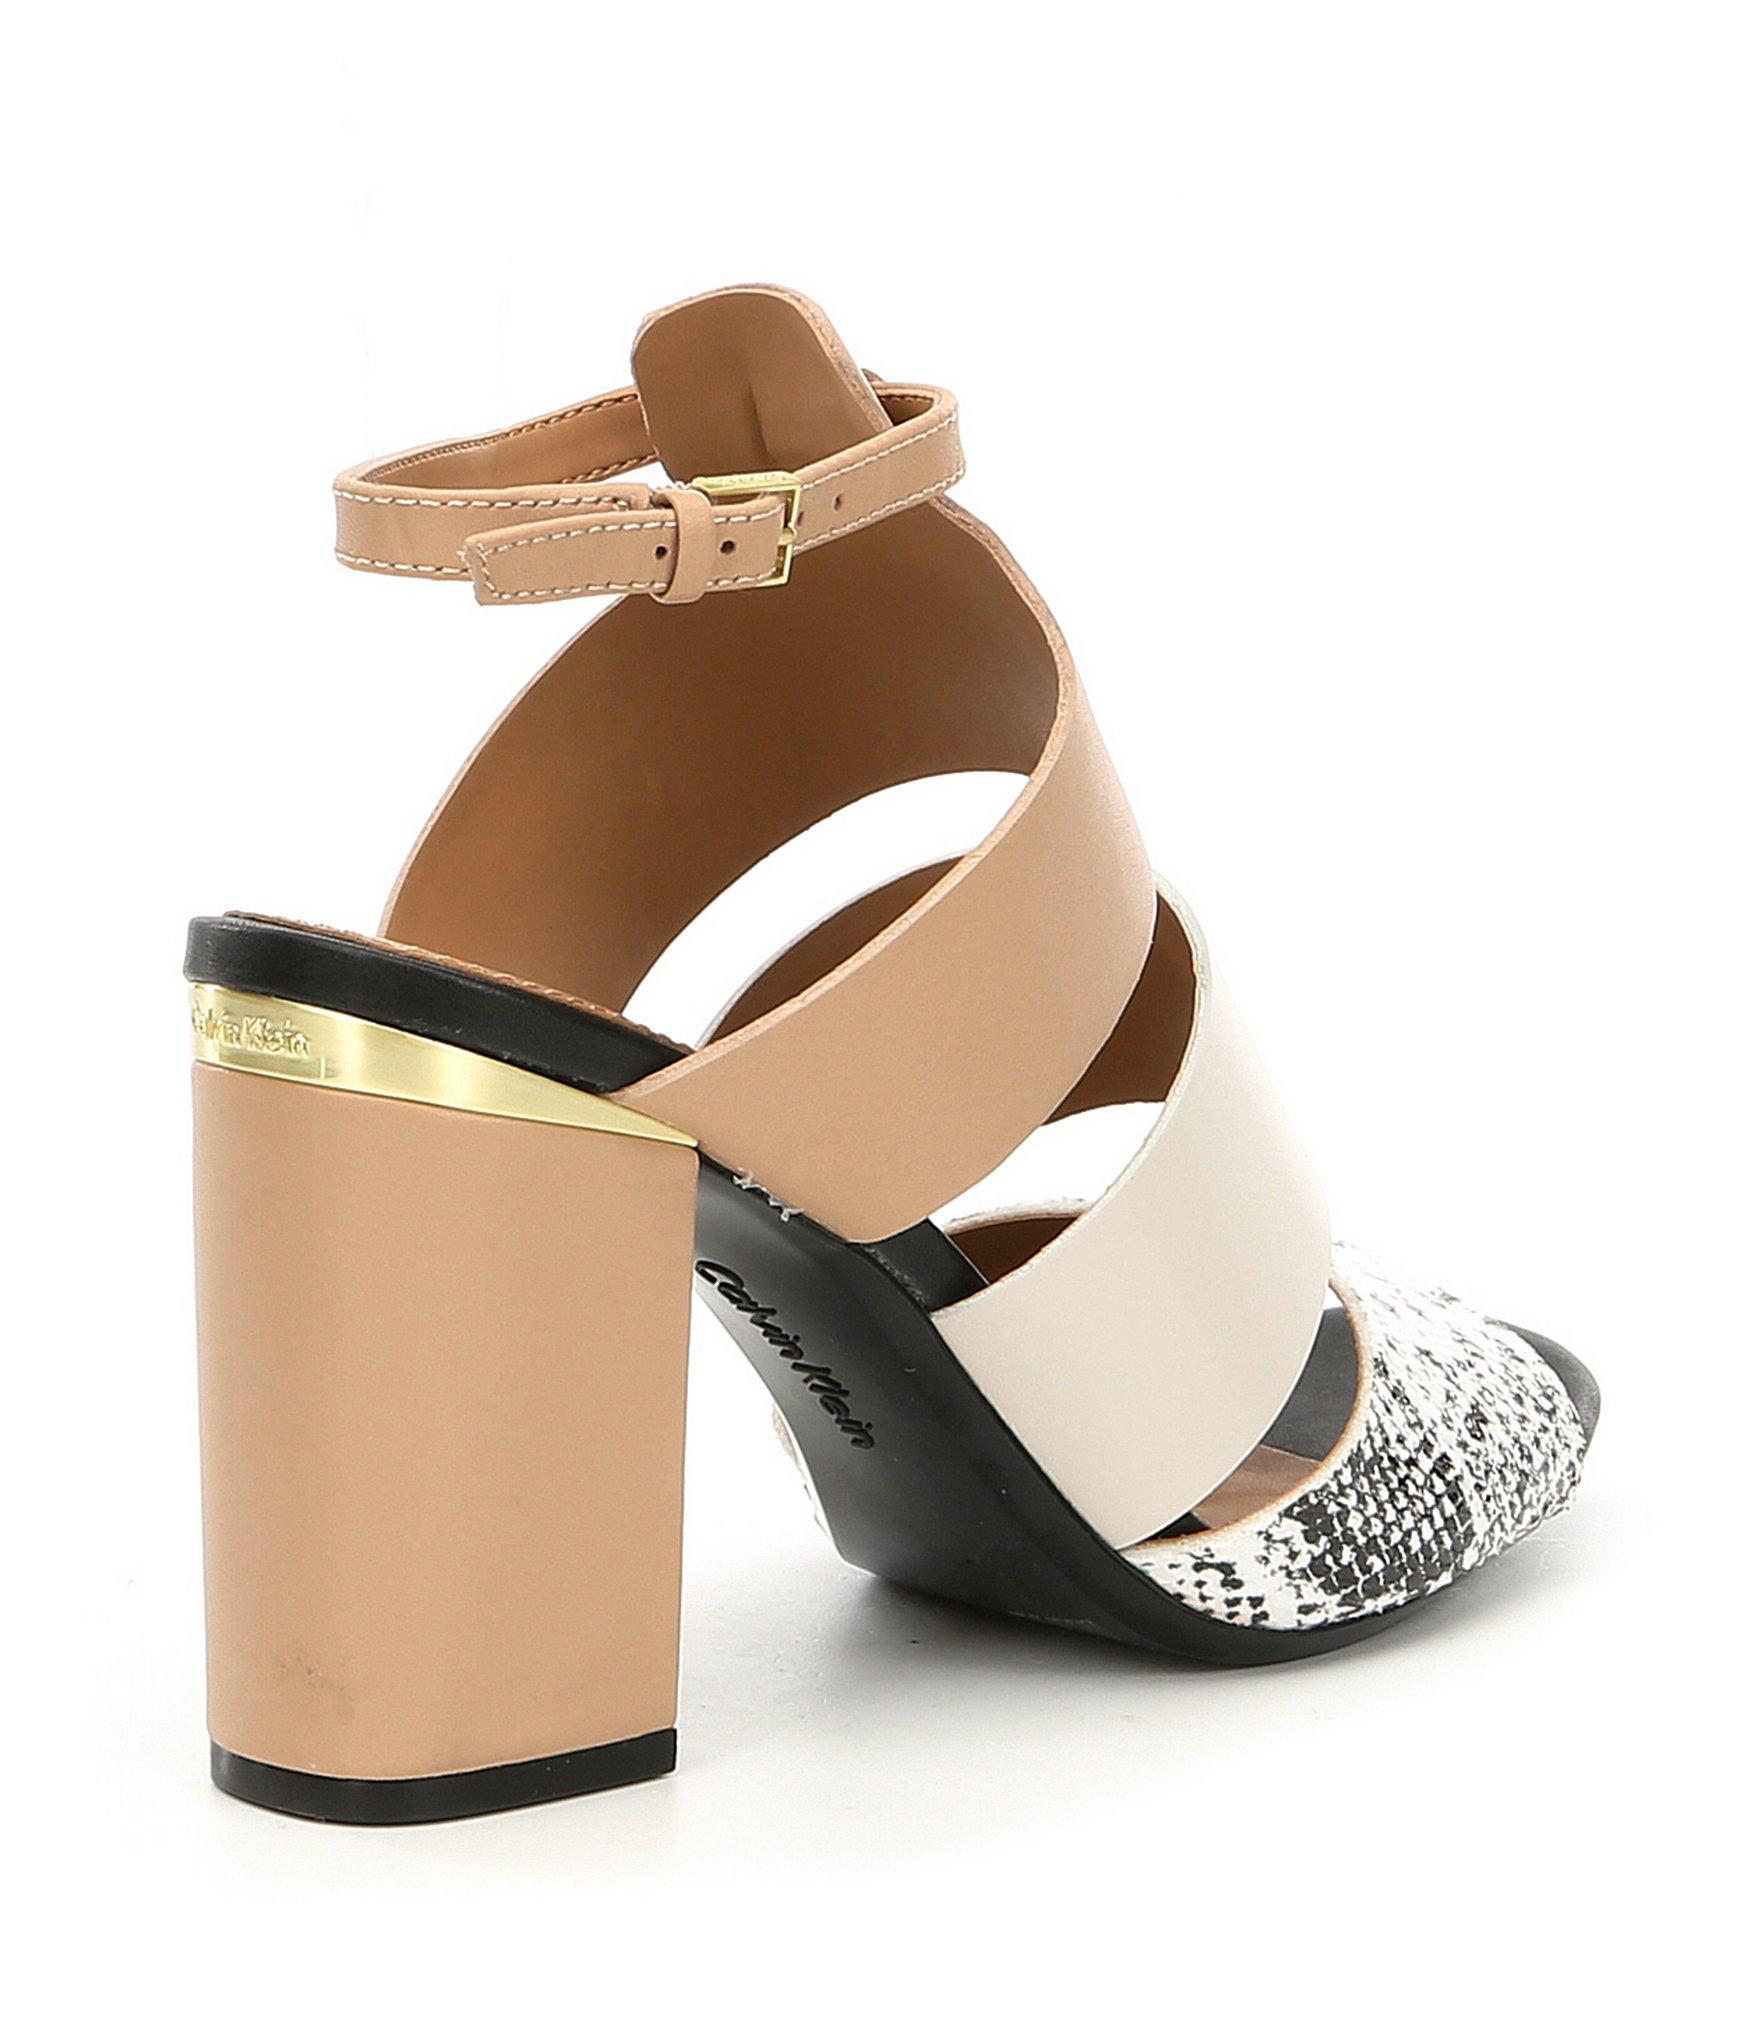 a59695f324a Lyst - Calvin Klein Caran Colorblock Snake Print Block Heel Dress ...